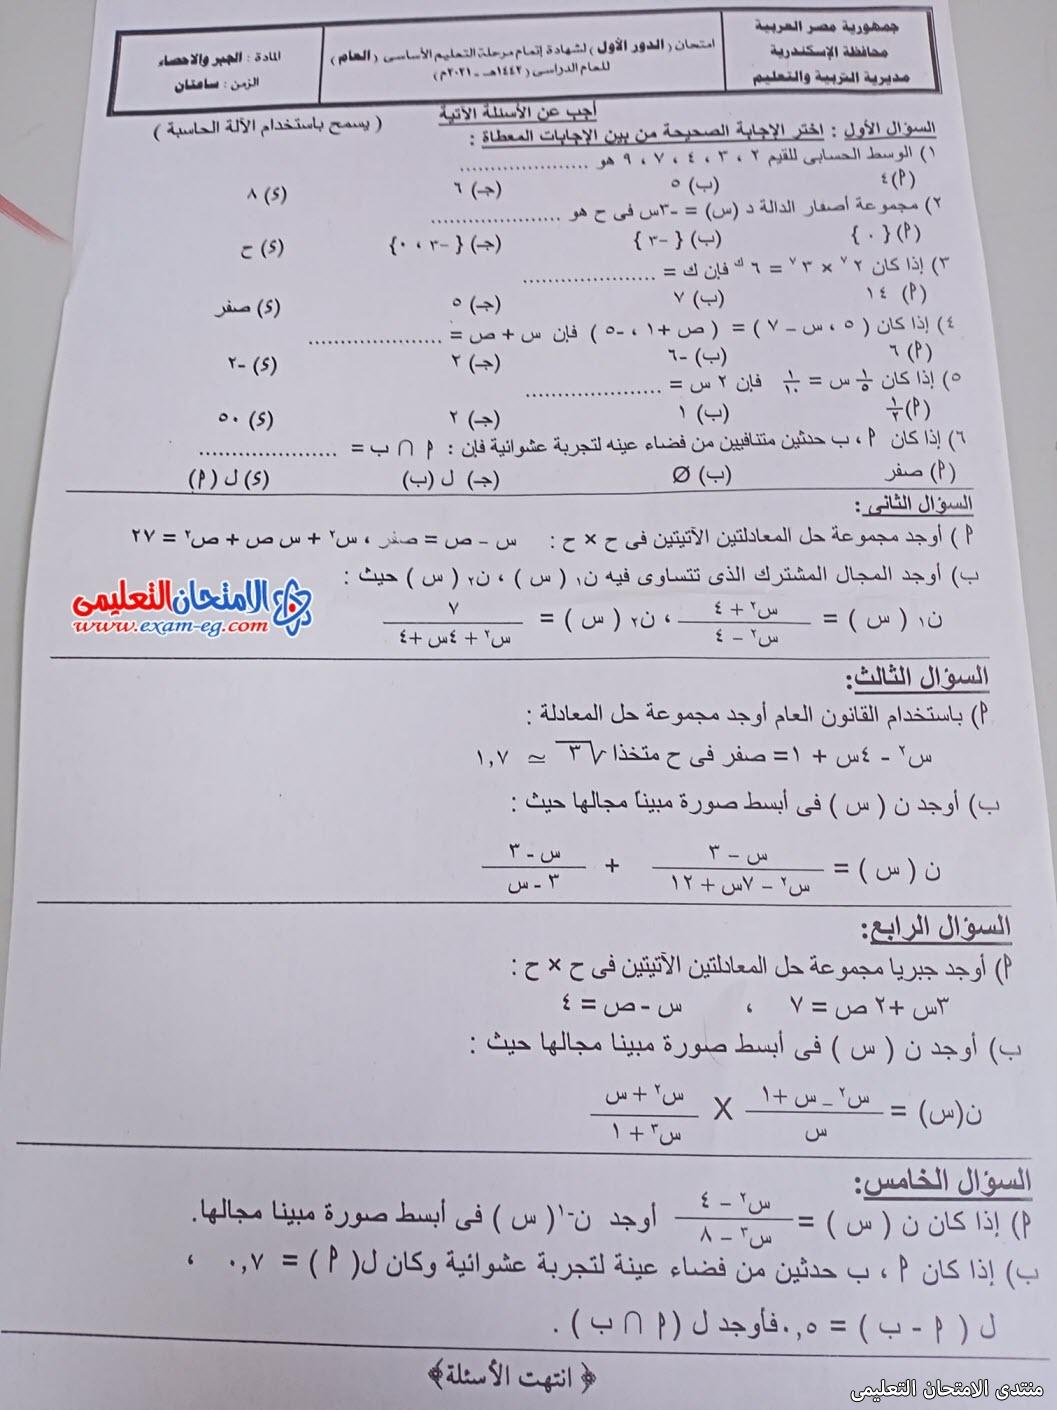 exam-eg.com_162308284958311.jpg